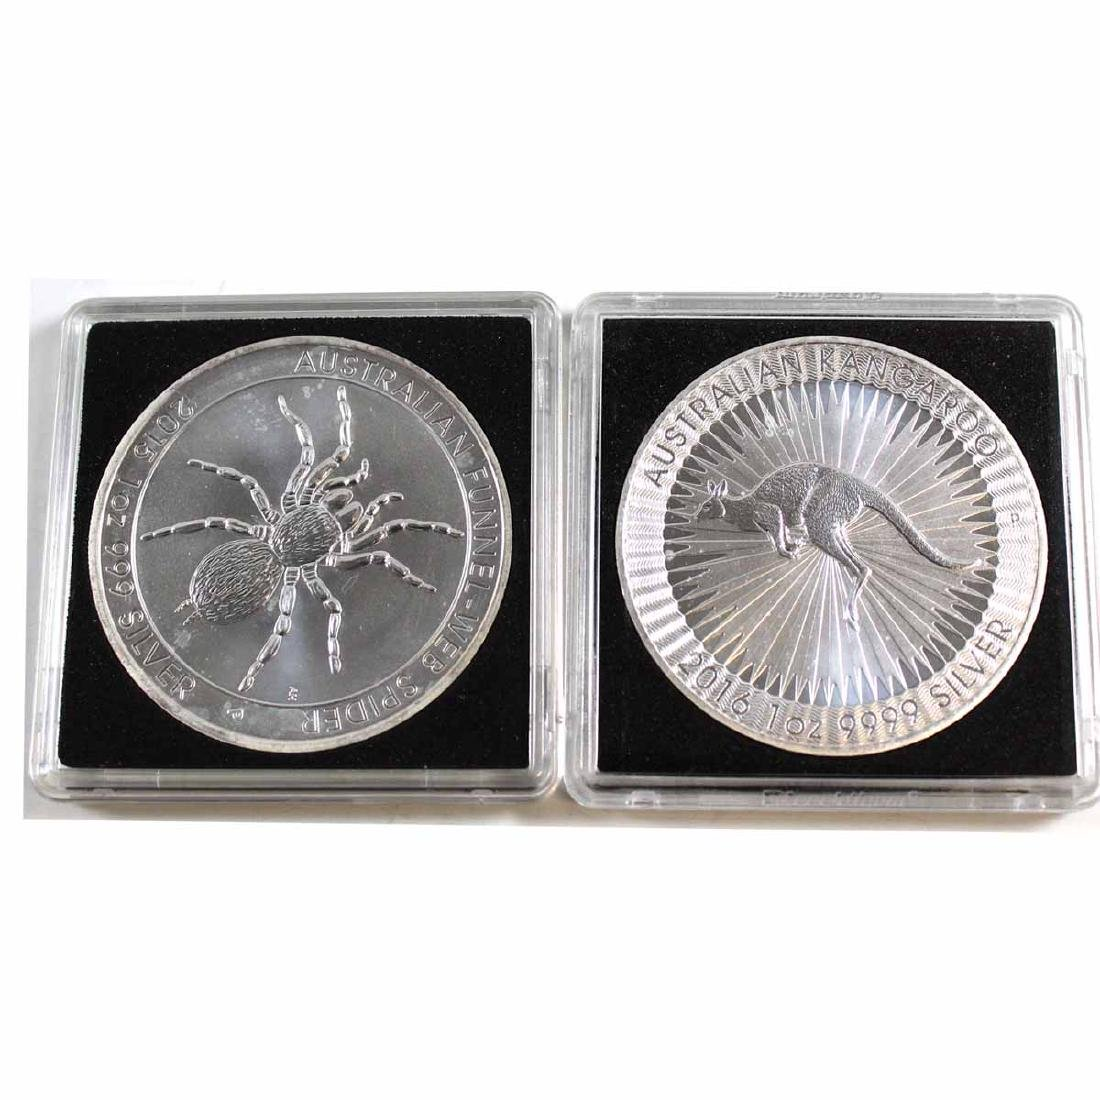 Pair of Australia 1oz. .999 Fine Silver Coins - 2015